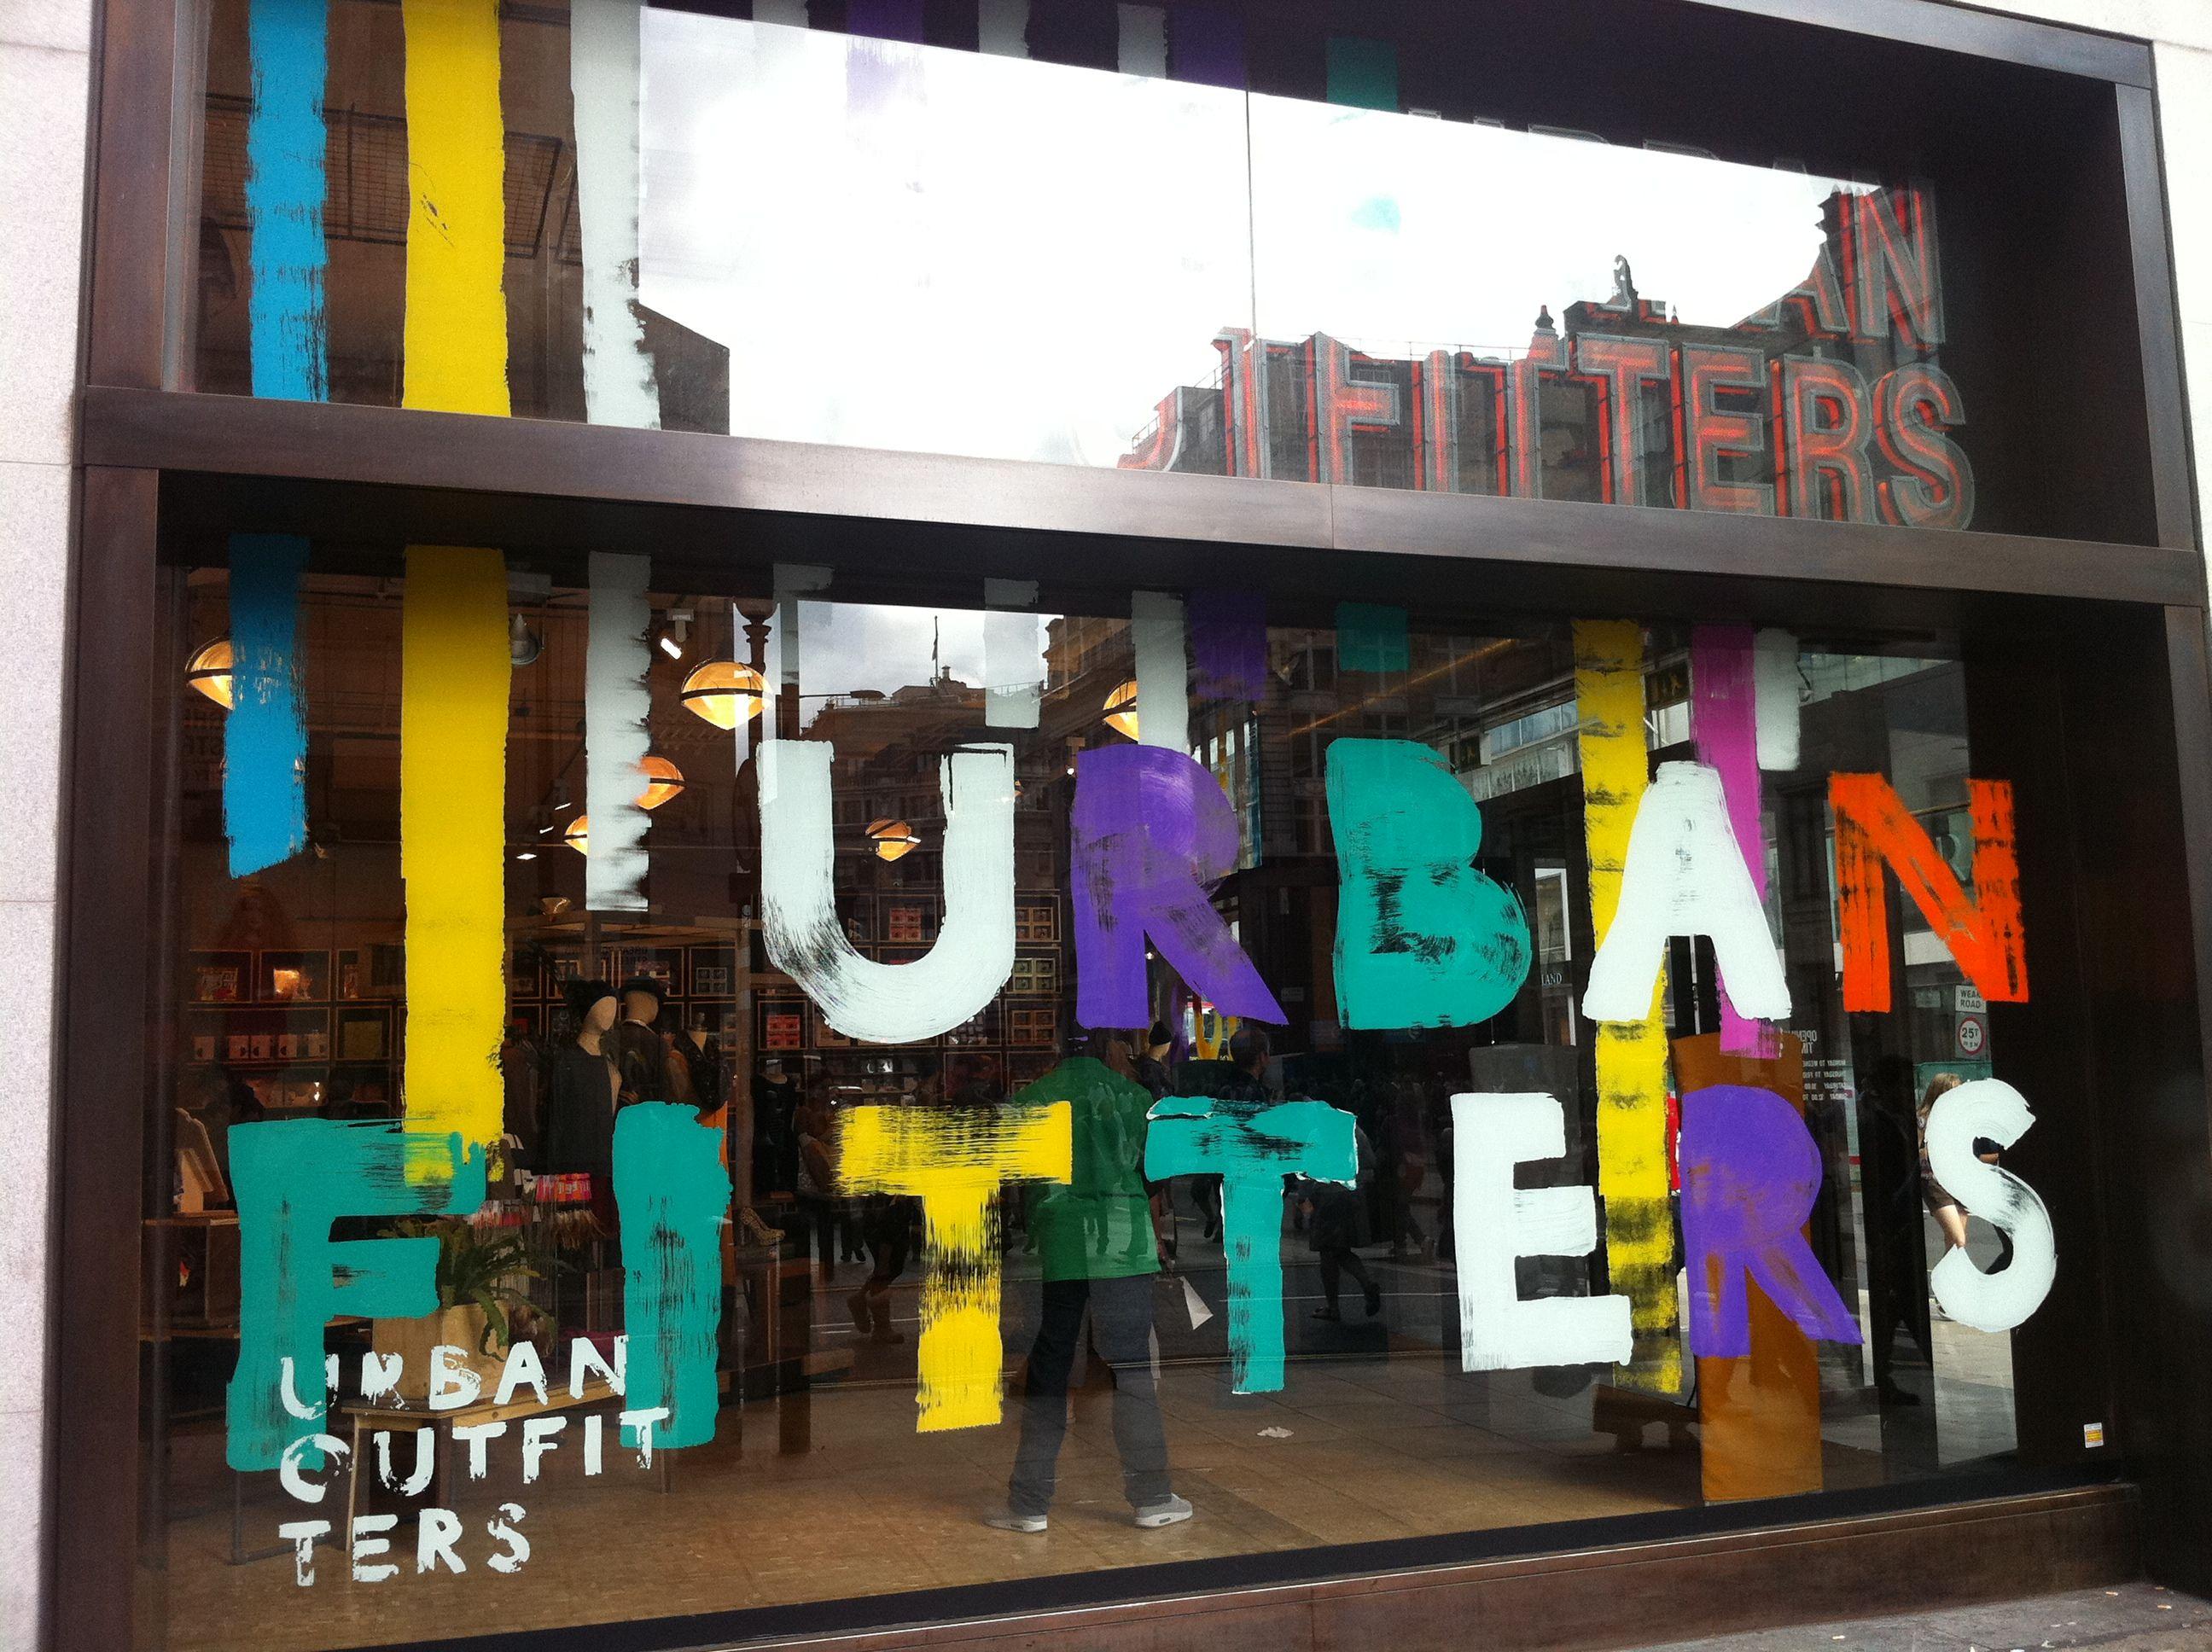 Urban Outfitters Oxford St 벽화 디스플레이 디스플레이 디자인